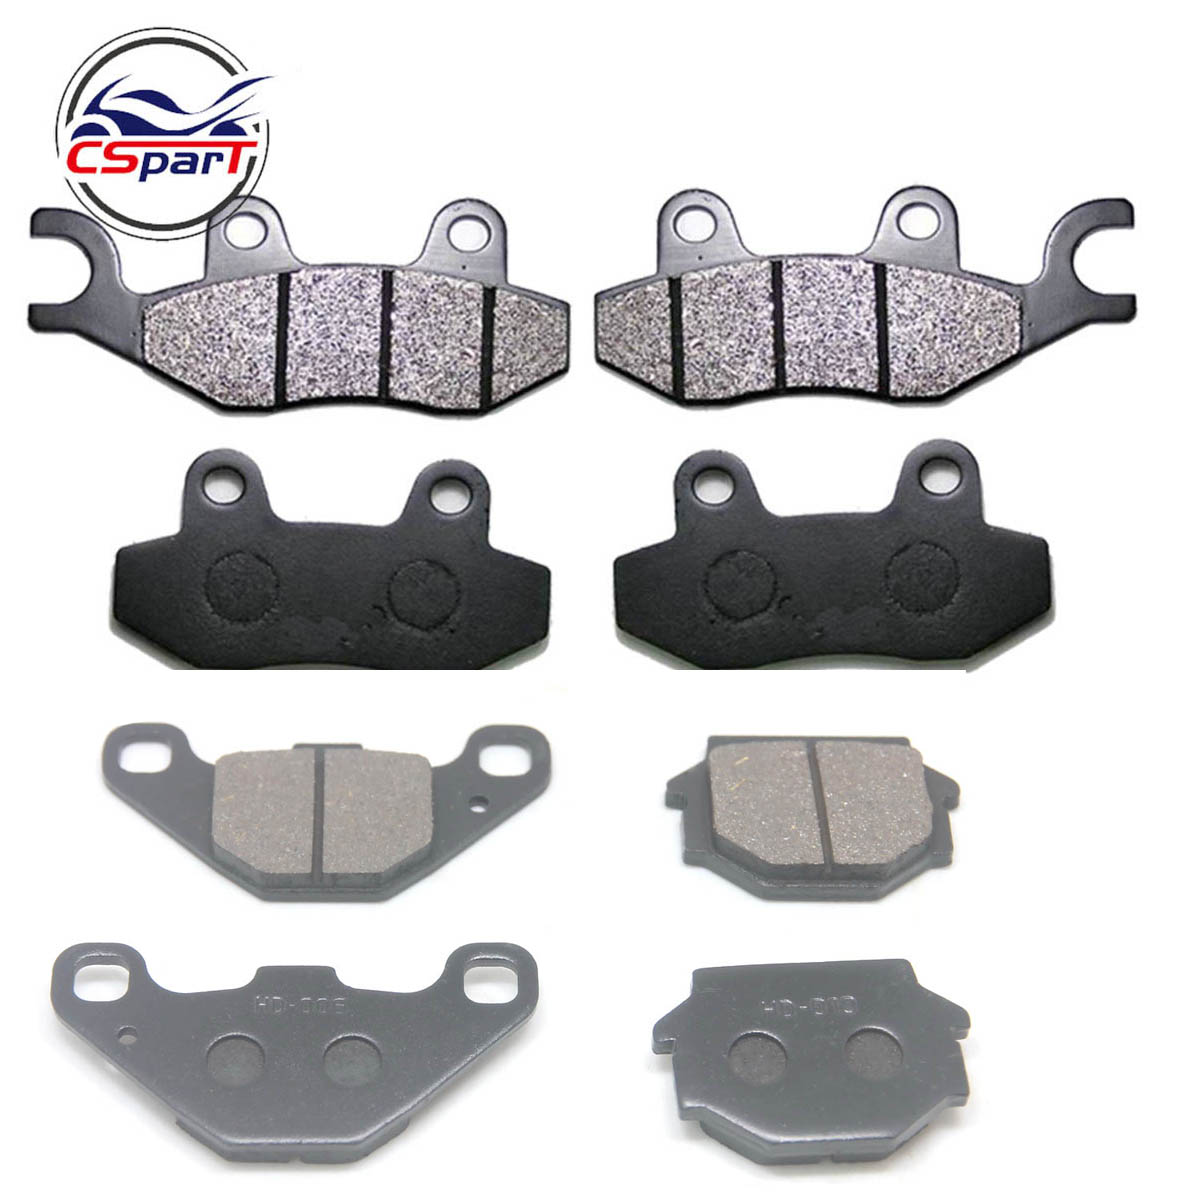 4 Sets Front  Brake Pad For CFMoto UFORCE CF500 500 550 800 U5 U8 500CC 800CC UTV 9060-080910 9060-080810 7030-081520